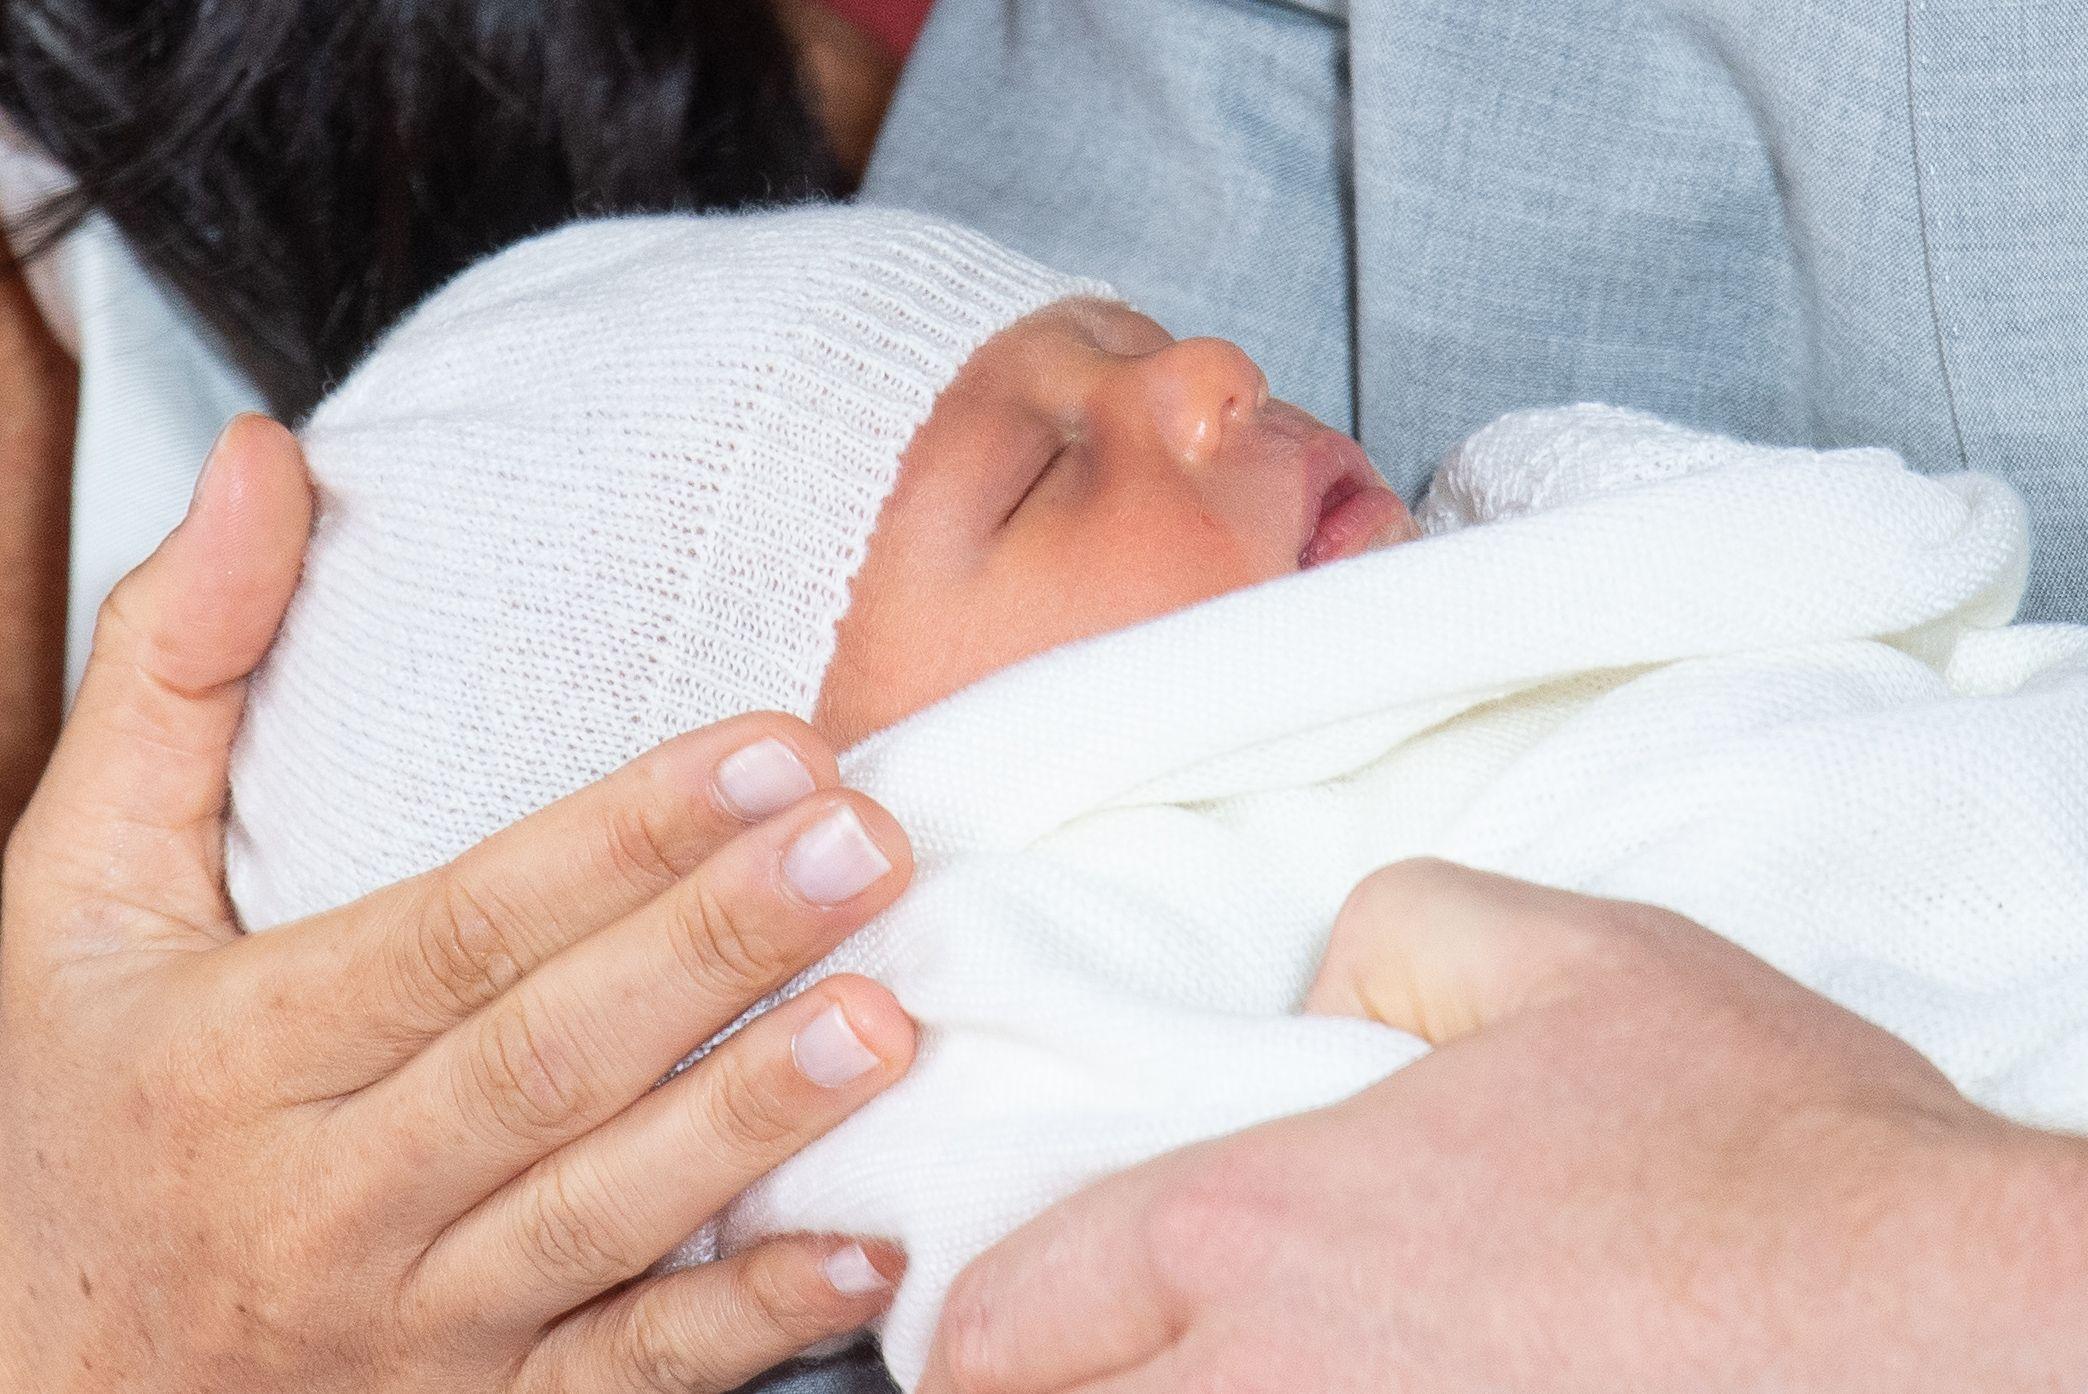 Ellen DeGeneres reveals baby Archie looks just like Prince Harry